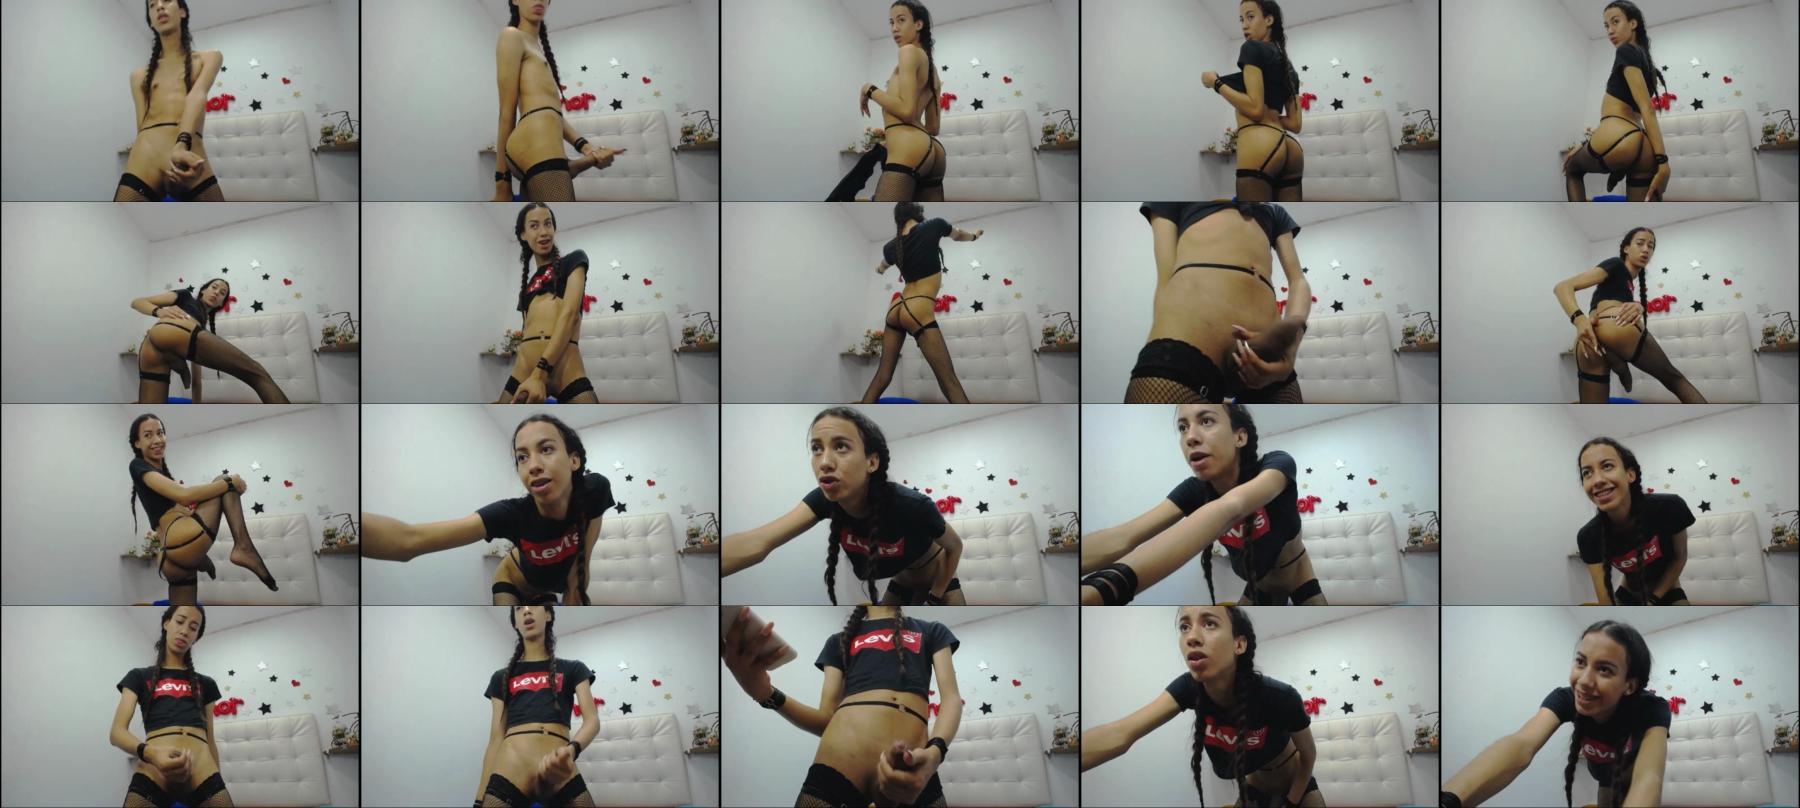 Lovelycaroll Porn CAM SHOW @ Chaturbate 31-07-2021